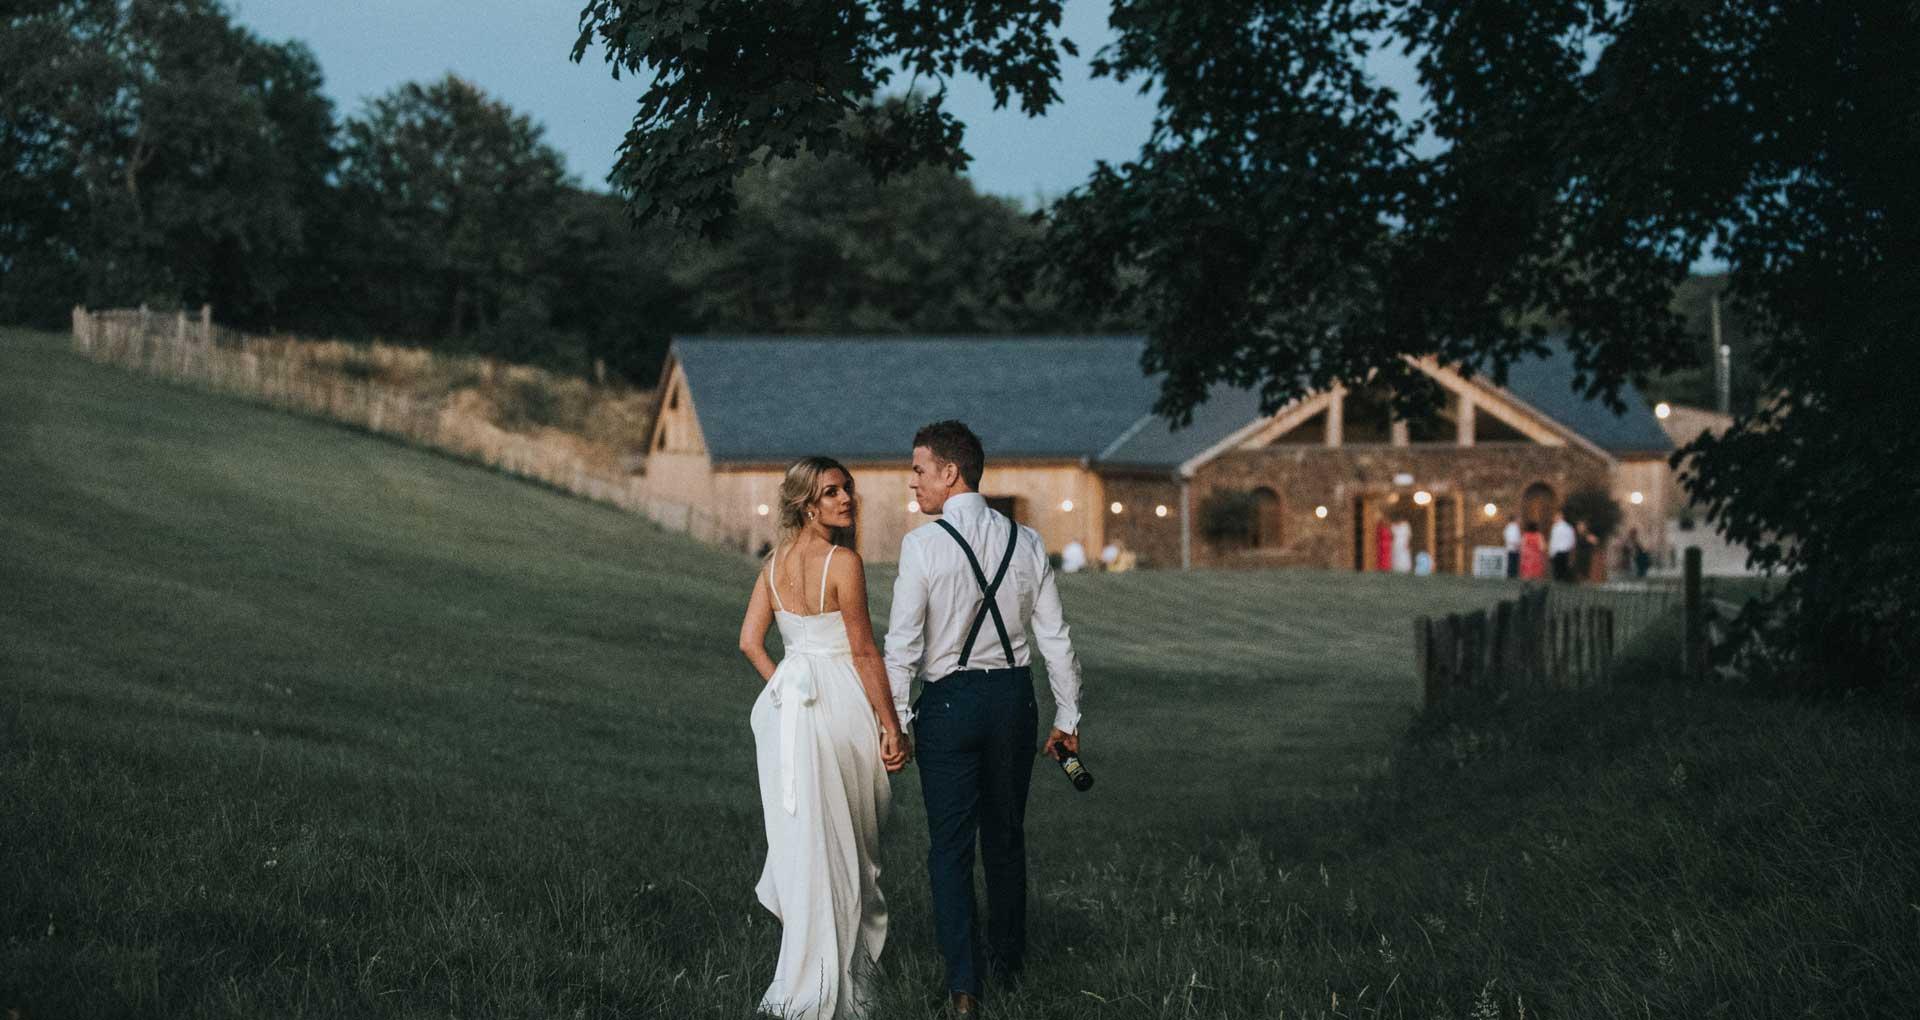 Exclusive Use Wedding Venues Cornwall